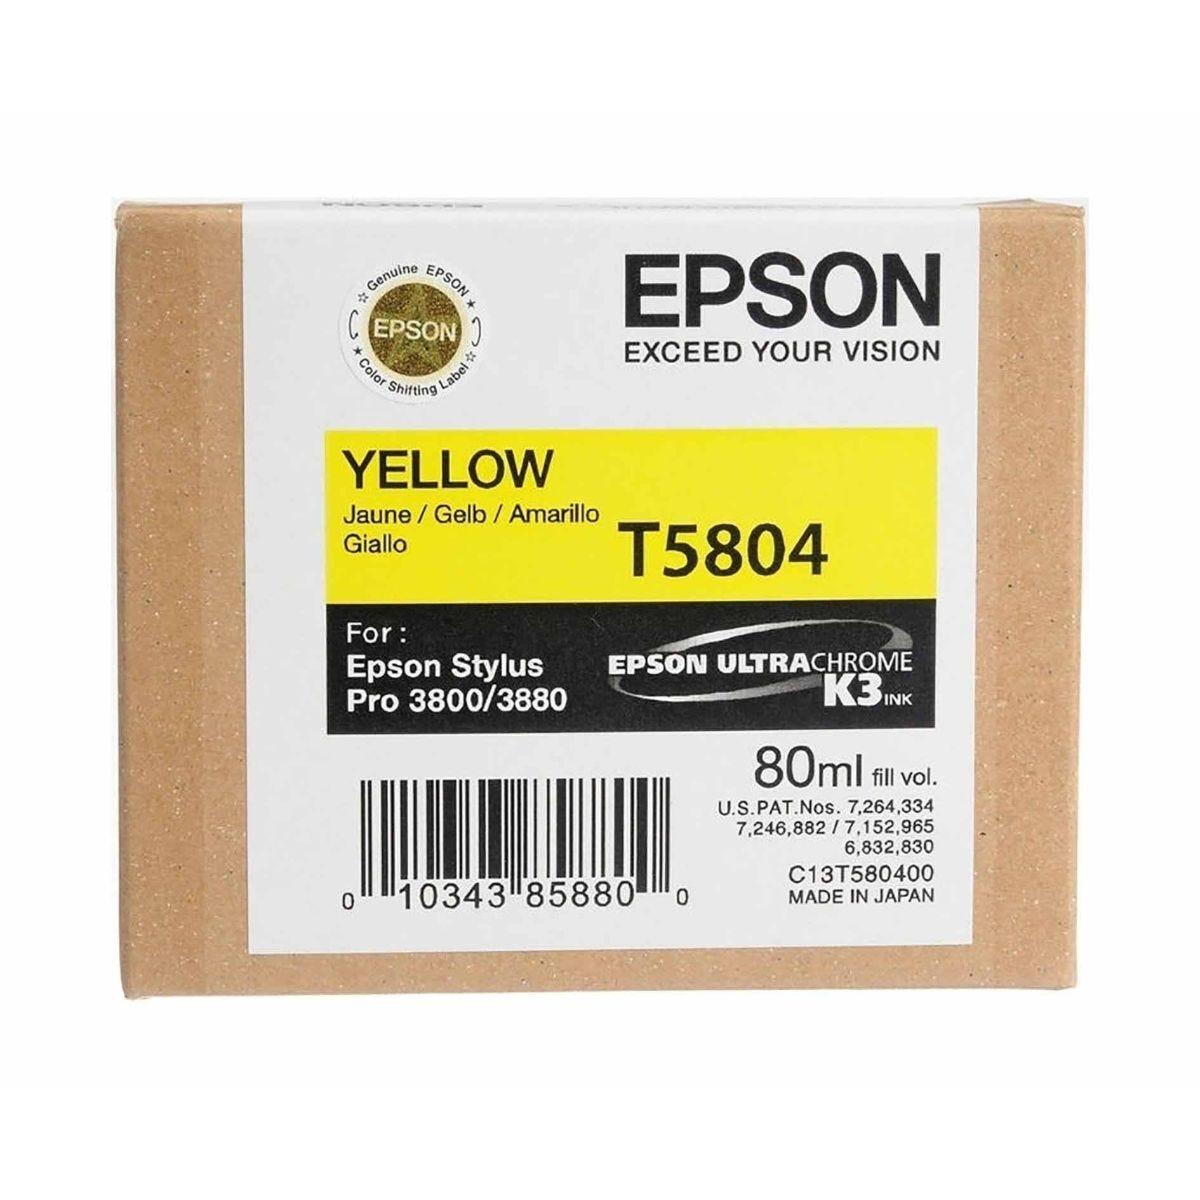 Epson PRO3880 Ink Yellow